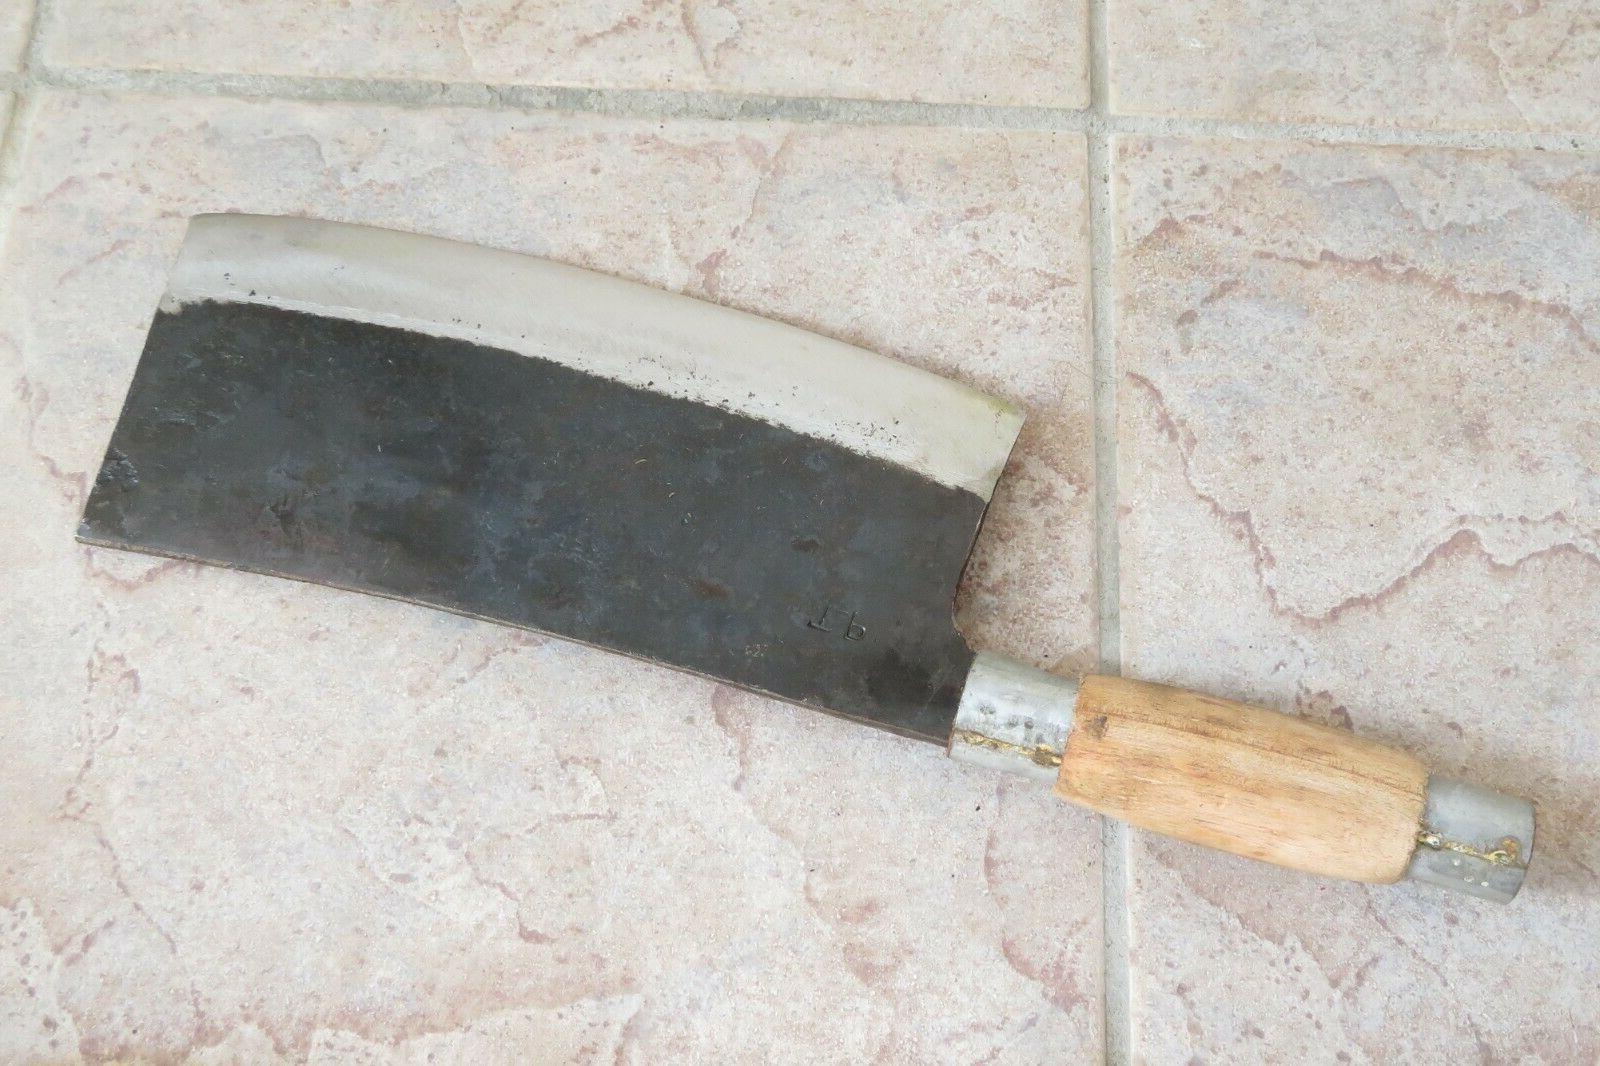 Crude Heavy Duty Cleaver Knife, Carbon Steel